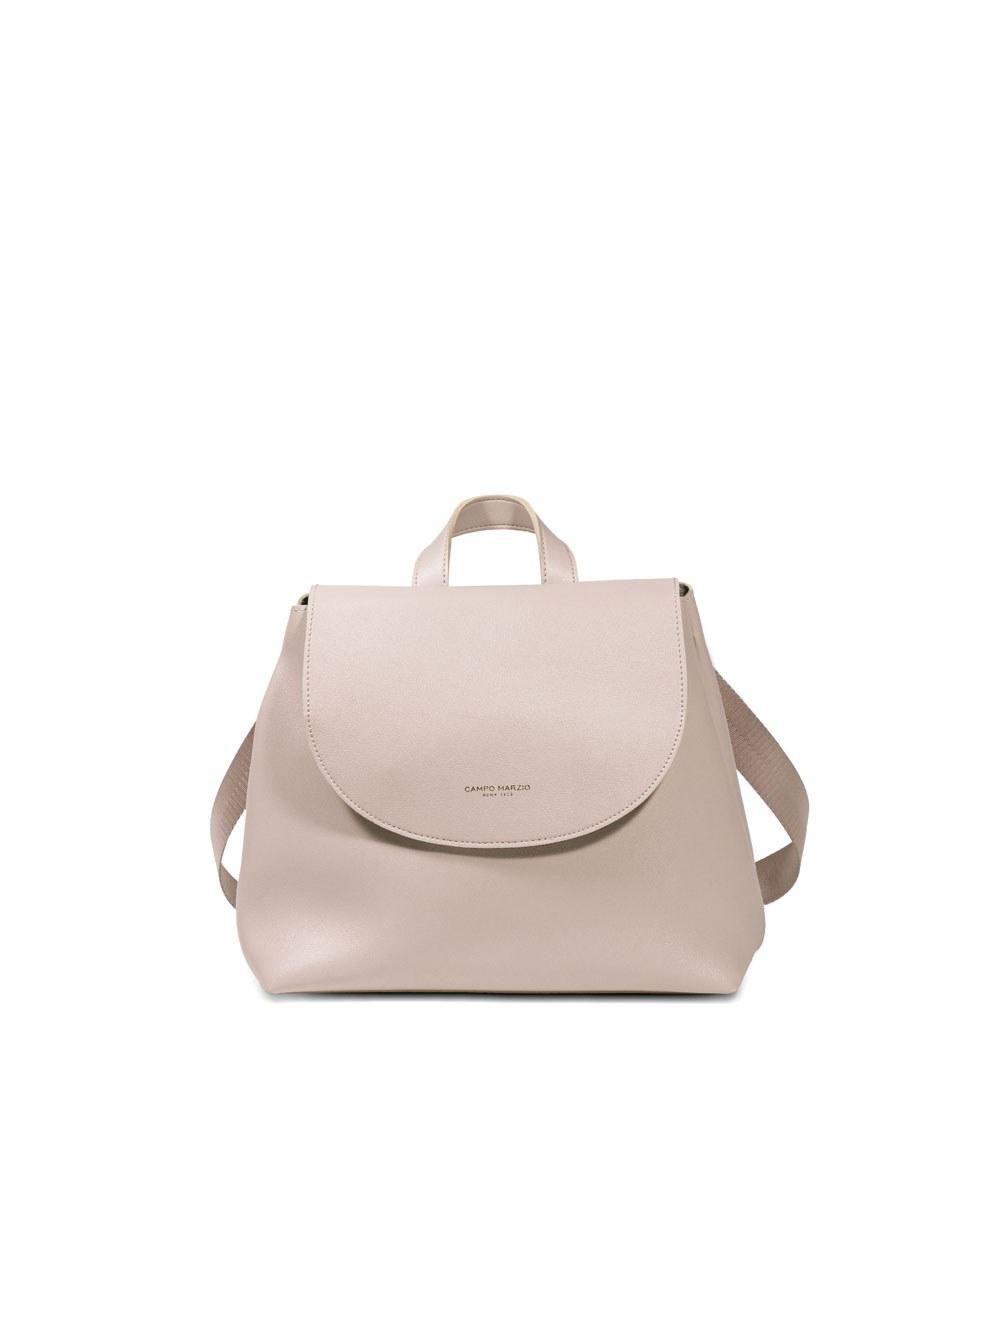 Bag Convertible In Backpack - Cream